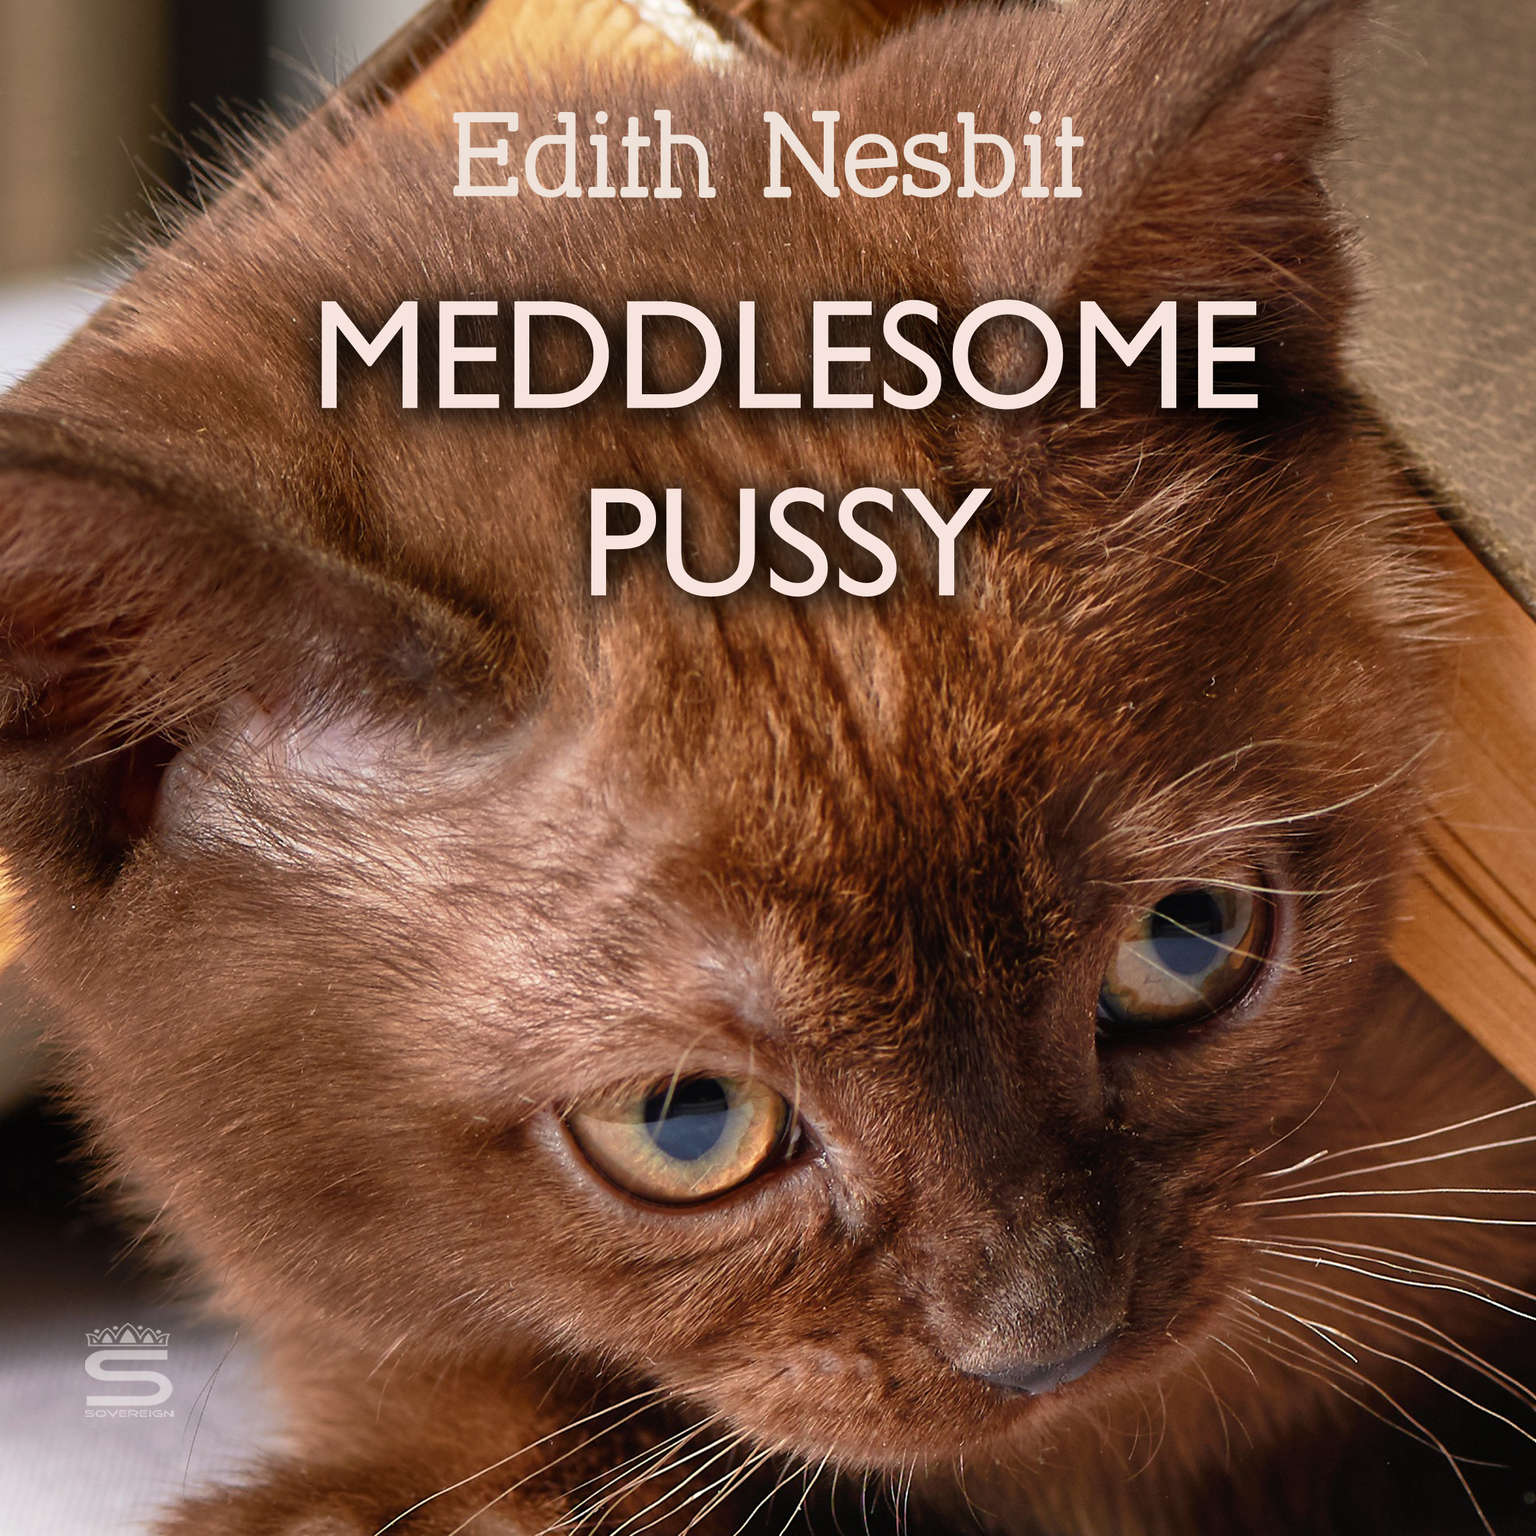 Meddlesome Pussy Audiobook, by E. Nesbit